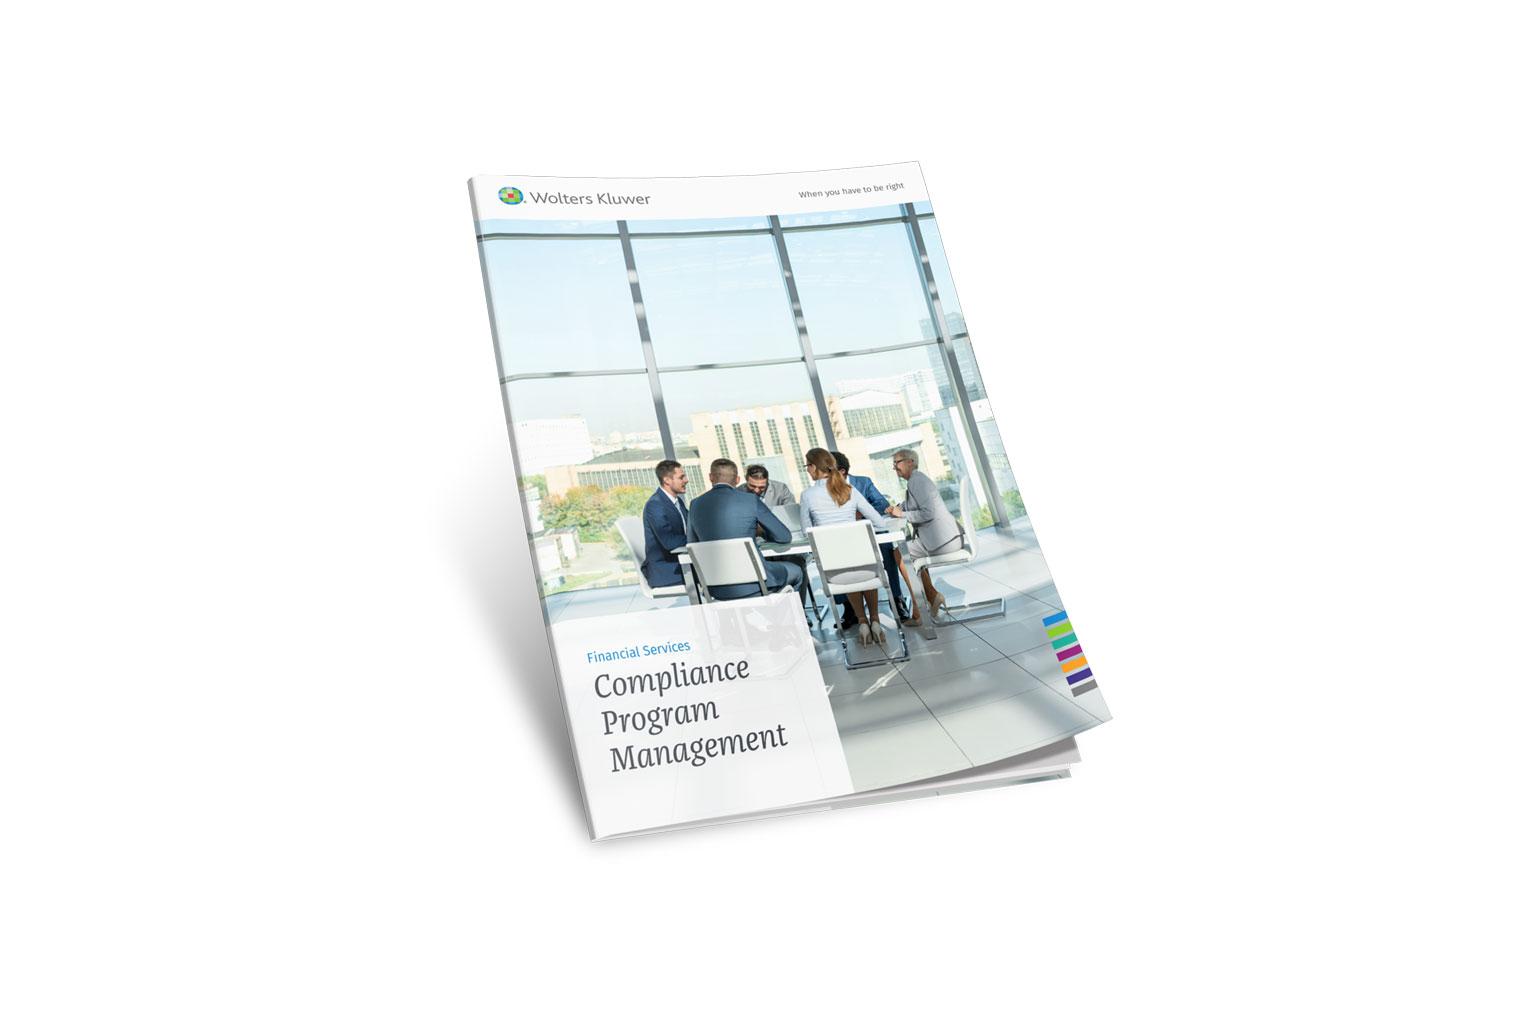 Compliance Program Management Brochure